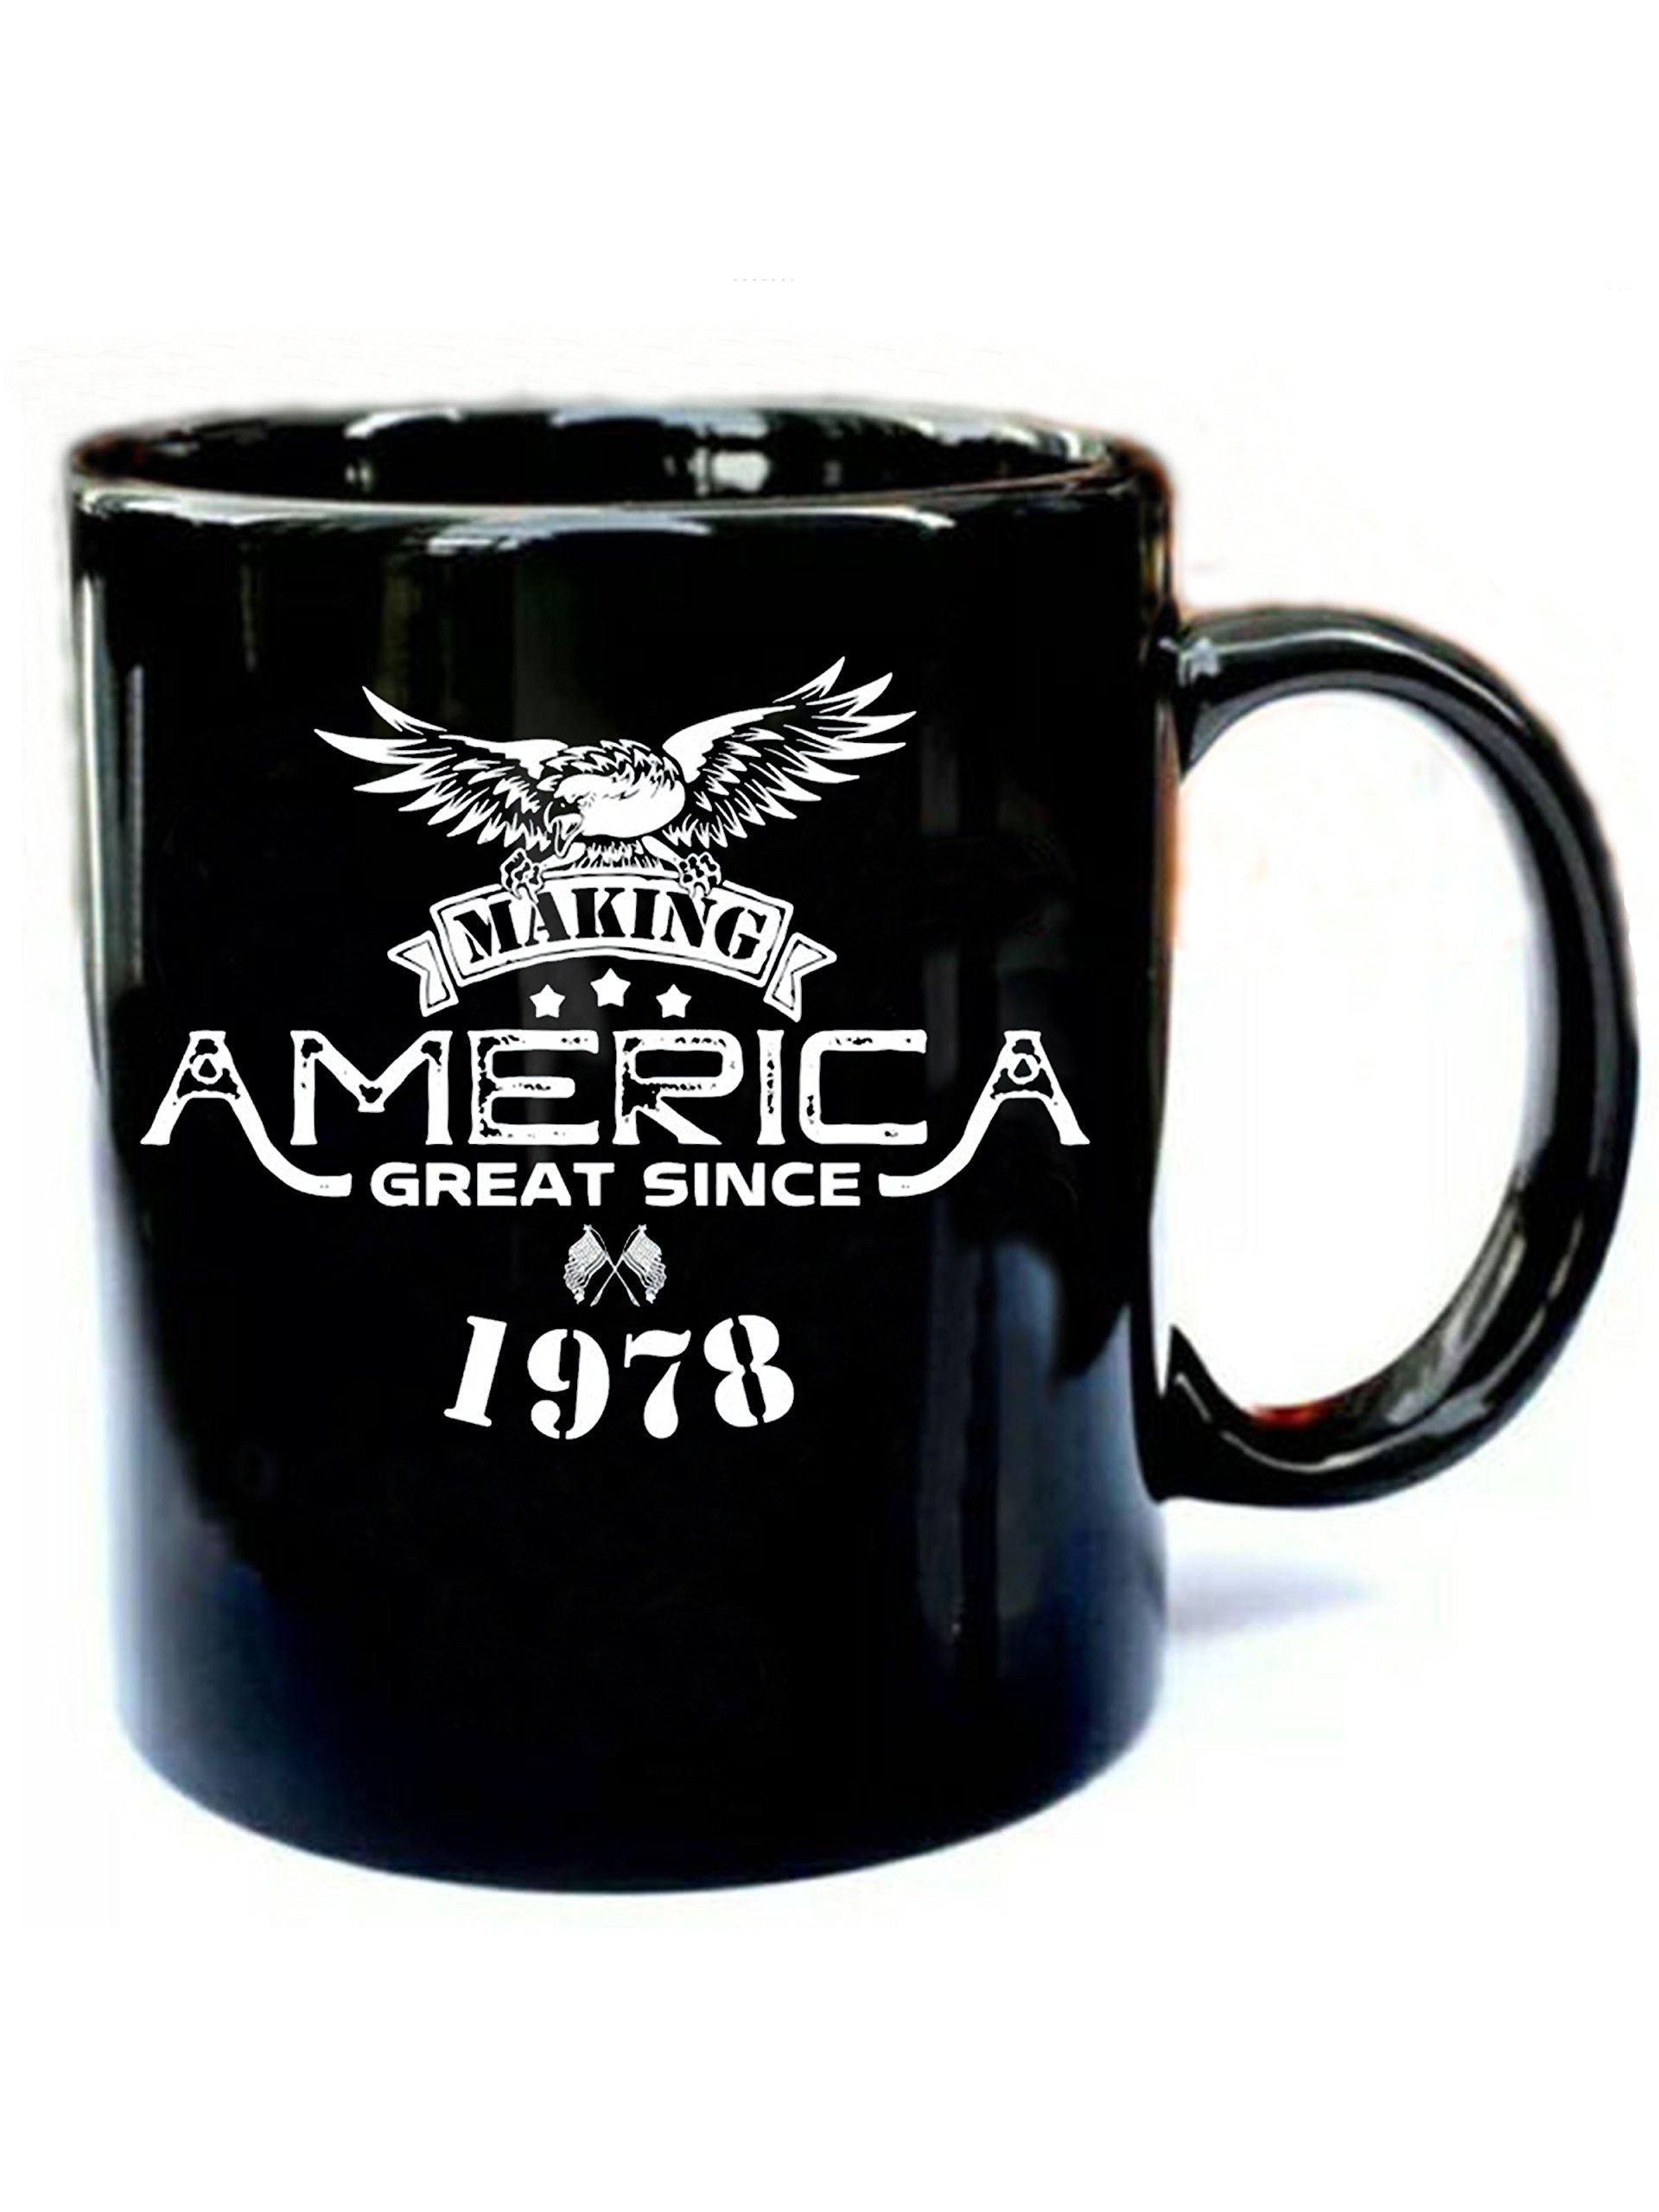 Making America Great Since 1978 - Funny Gift Black 11oz Ceramic Coffee Mug